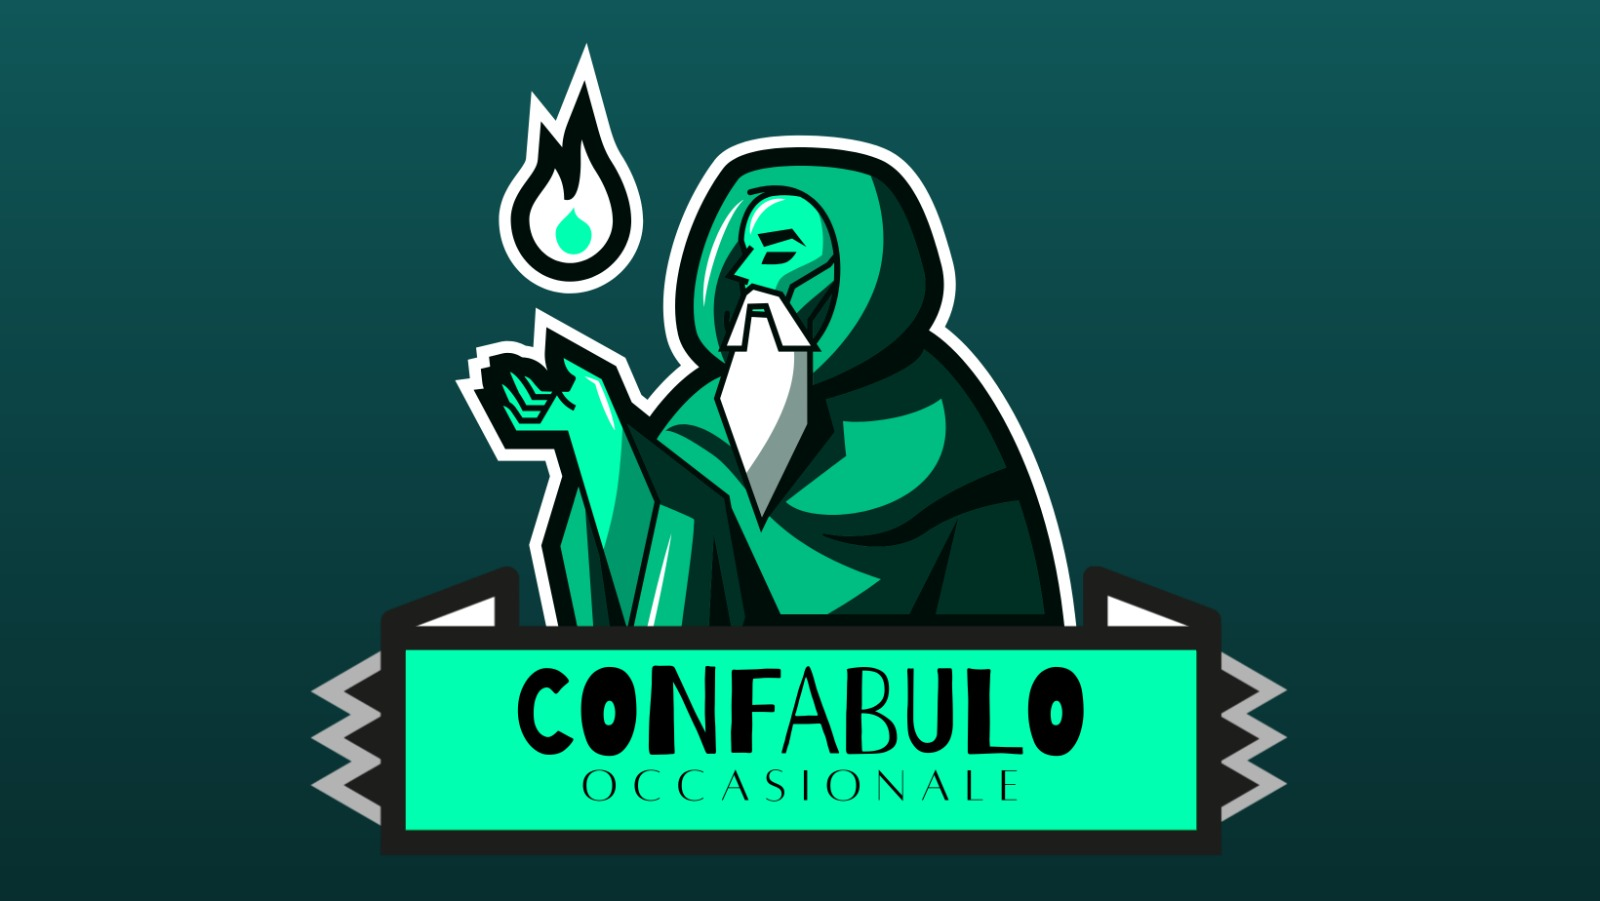 CONFABULO OCCASIONALE